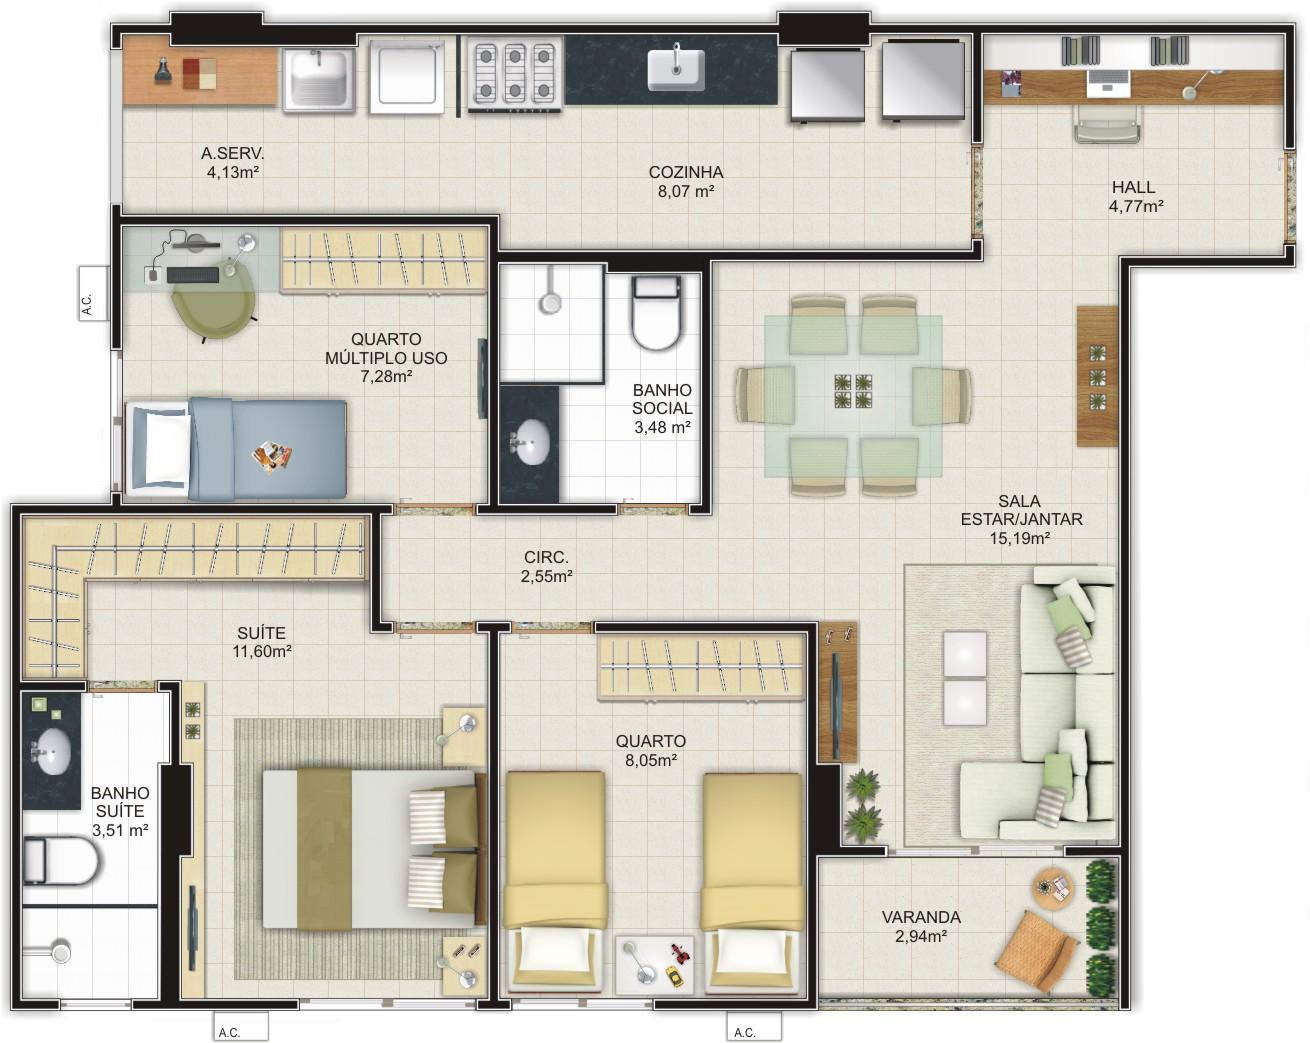 Plantas de Casas: Modelos Planta Baixa Projetos #886B43 1310 1043